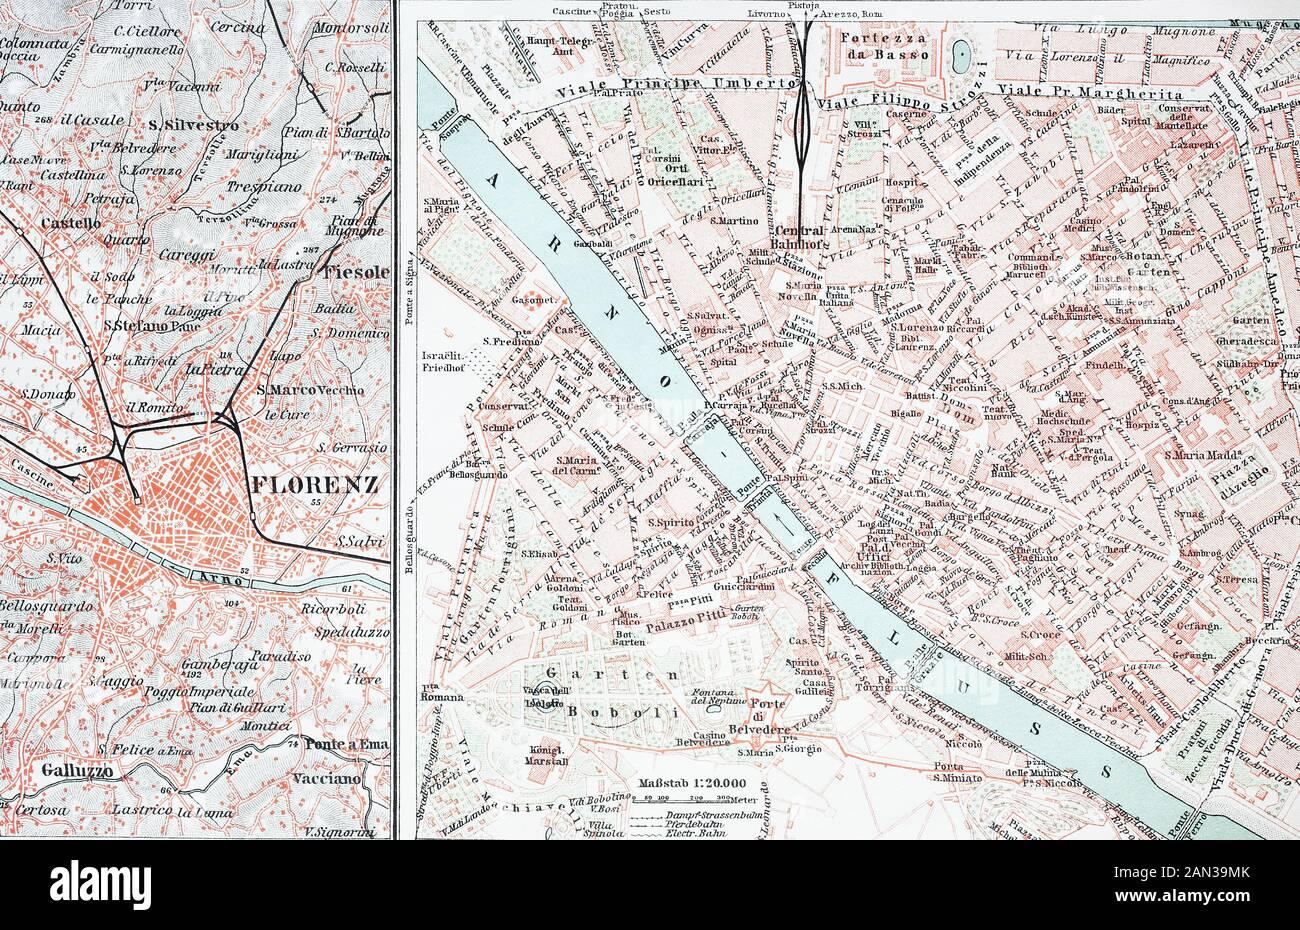 Firenze Cartina Centro Storico.Firenze Map Immagini E Fotos Stock Alamy